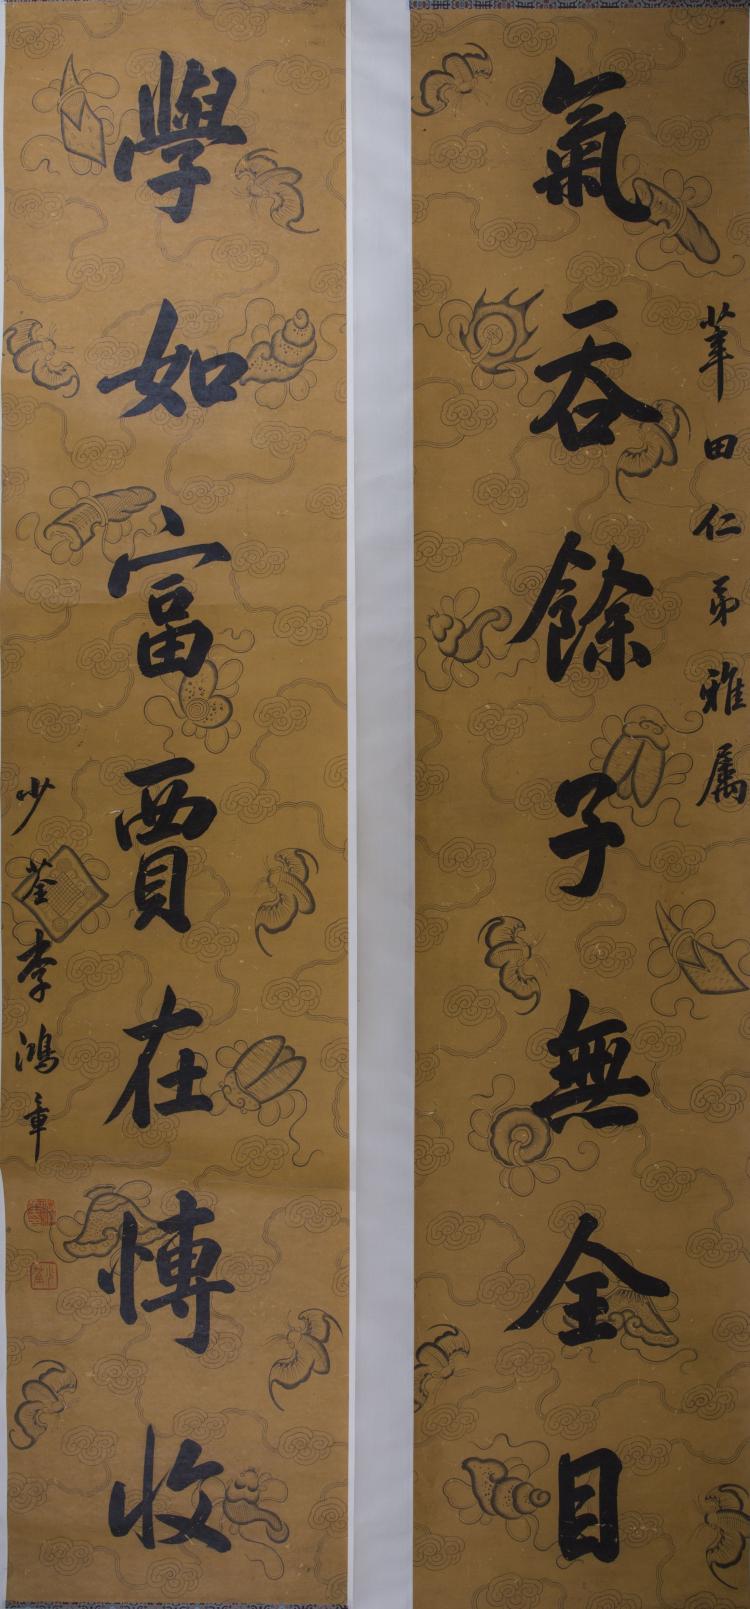 A CHINESE CALLIGRAPHY COUPLET, LI HONGZHANG